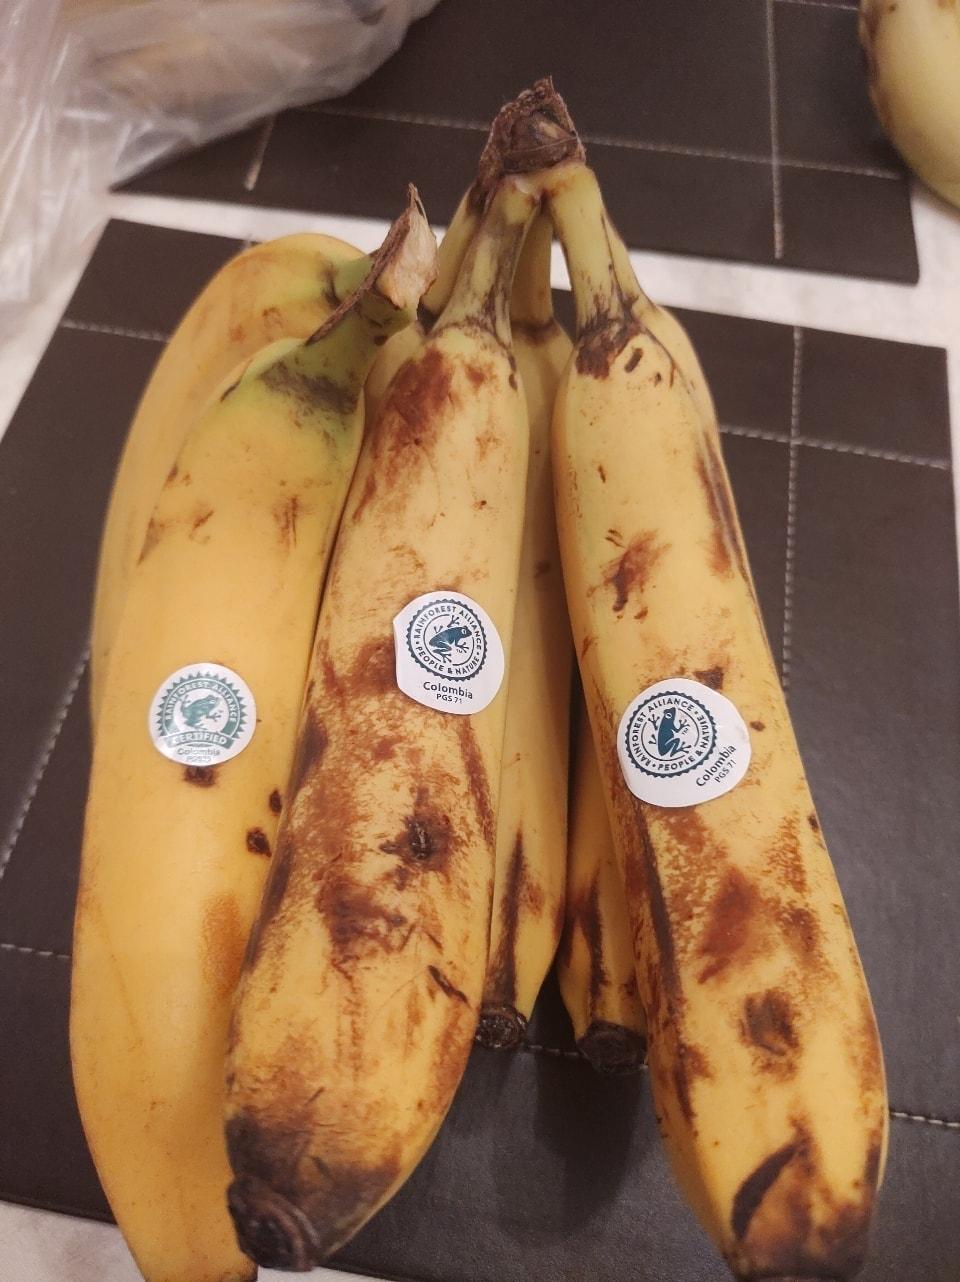 Bananas 🍌. Great for baking!